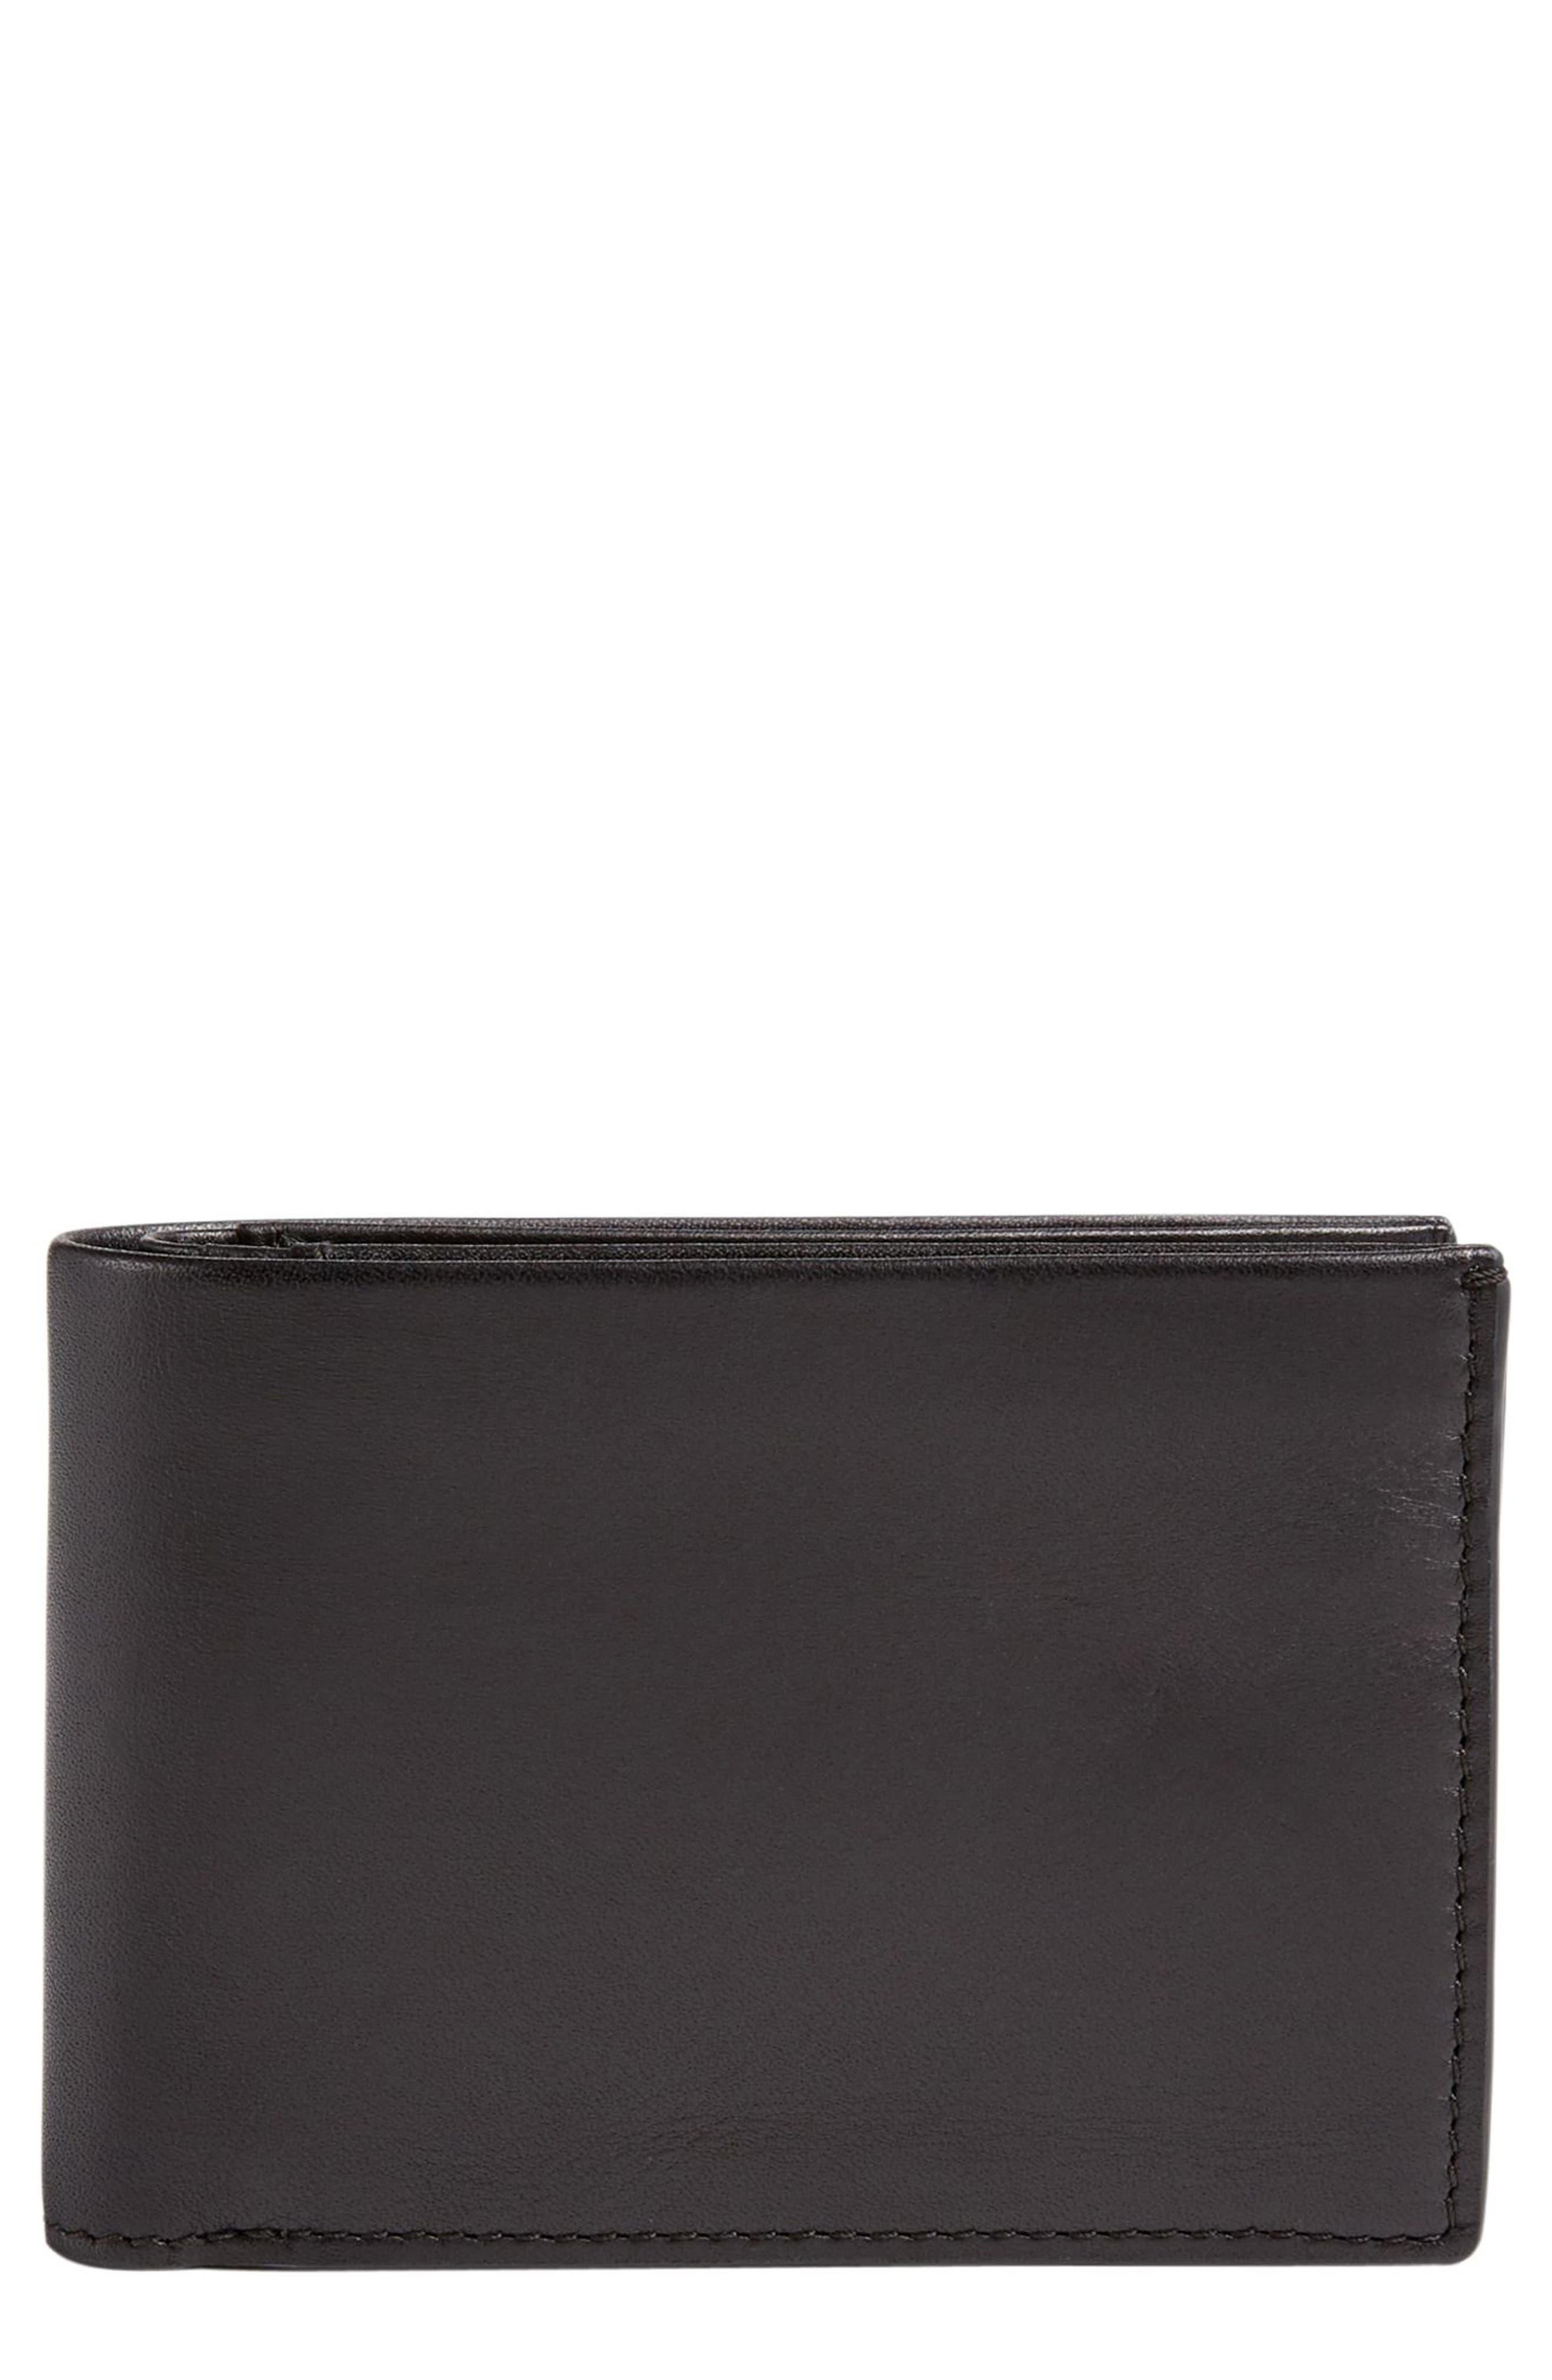 Skagen International Leather Bifold Wallet